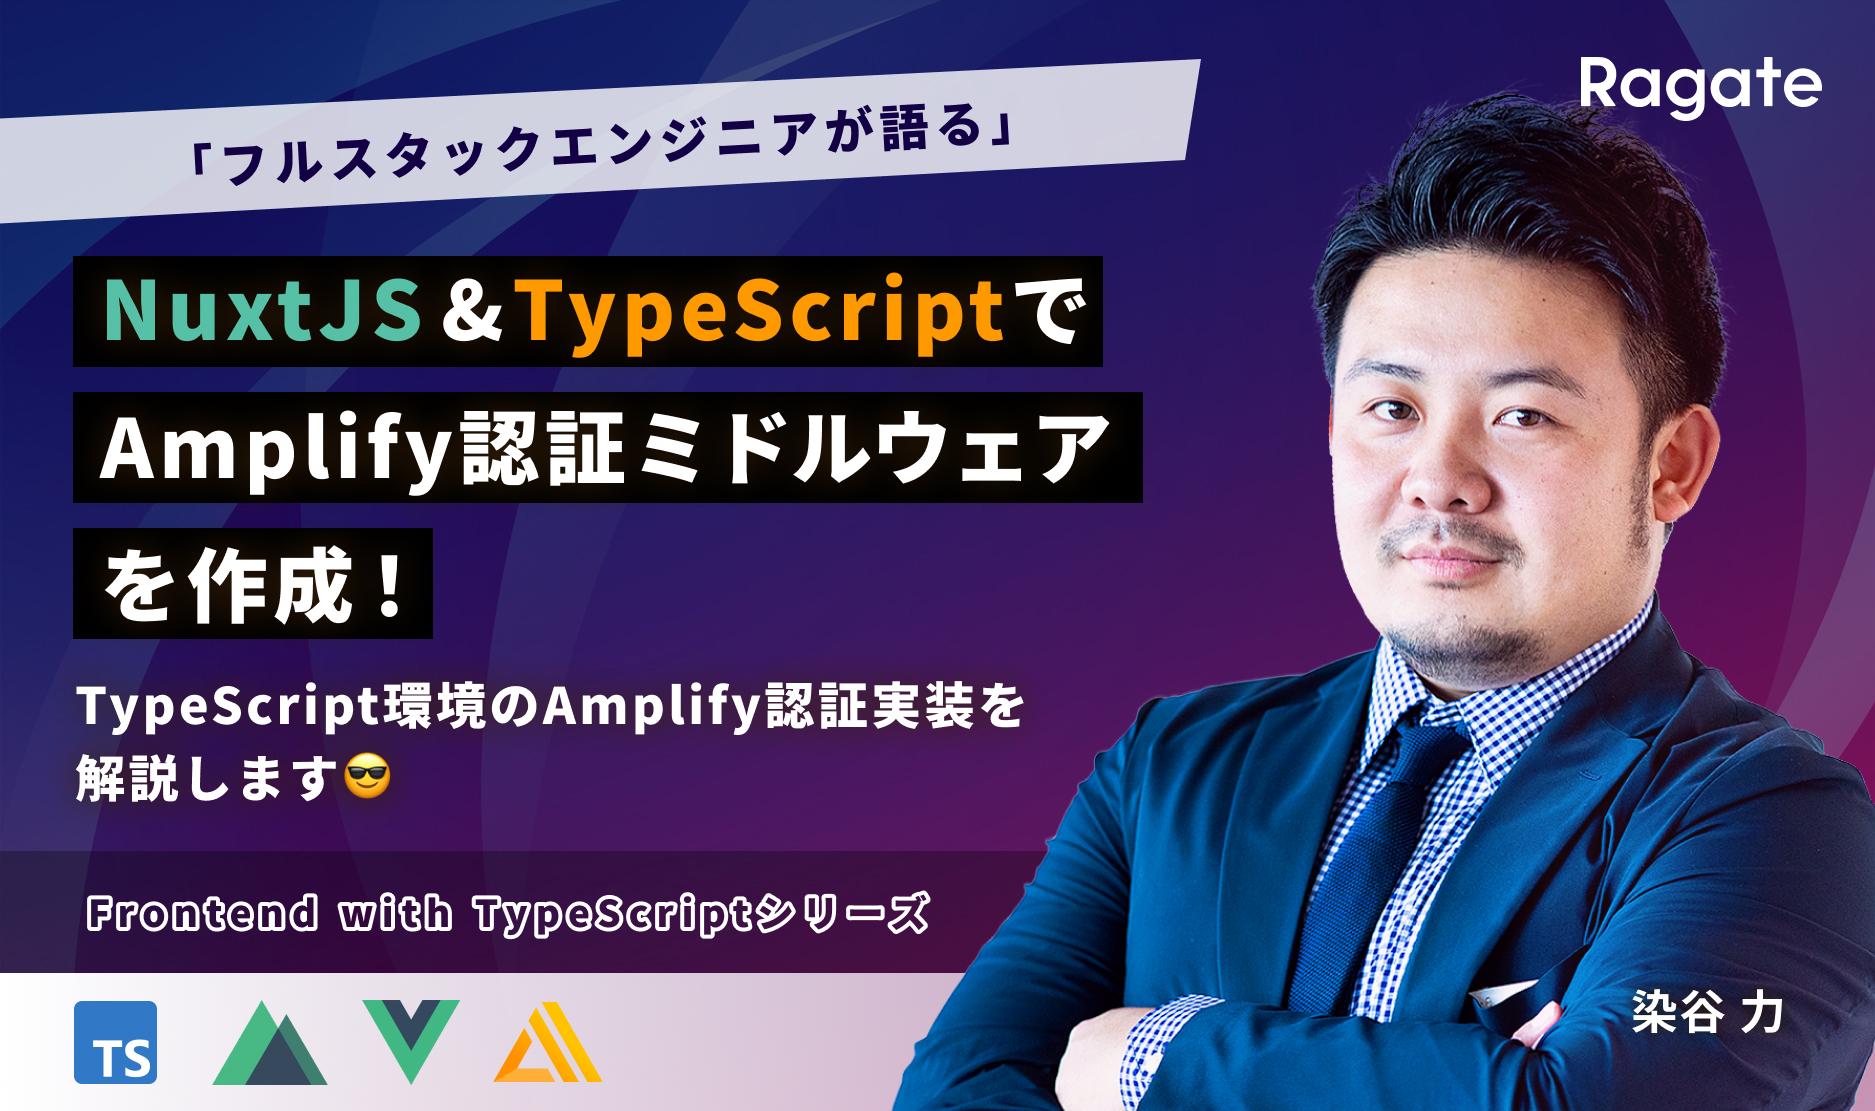 NuxtJSと TypeScriptでAmplify認証ミドルウェアを作成!TypeScript環境のAmplify認証実装を解説します😎